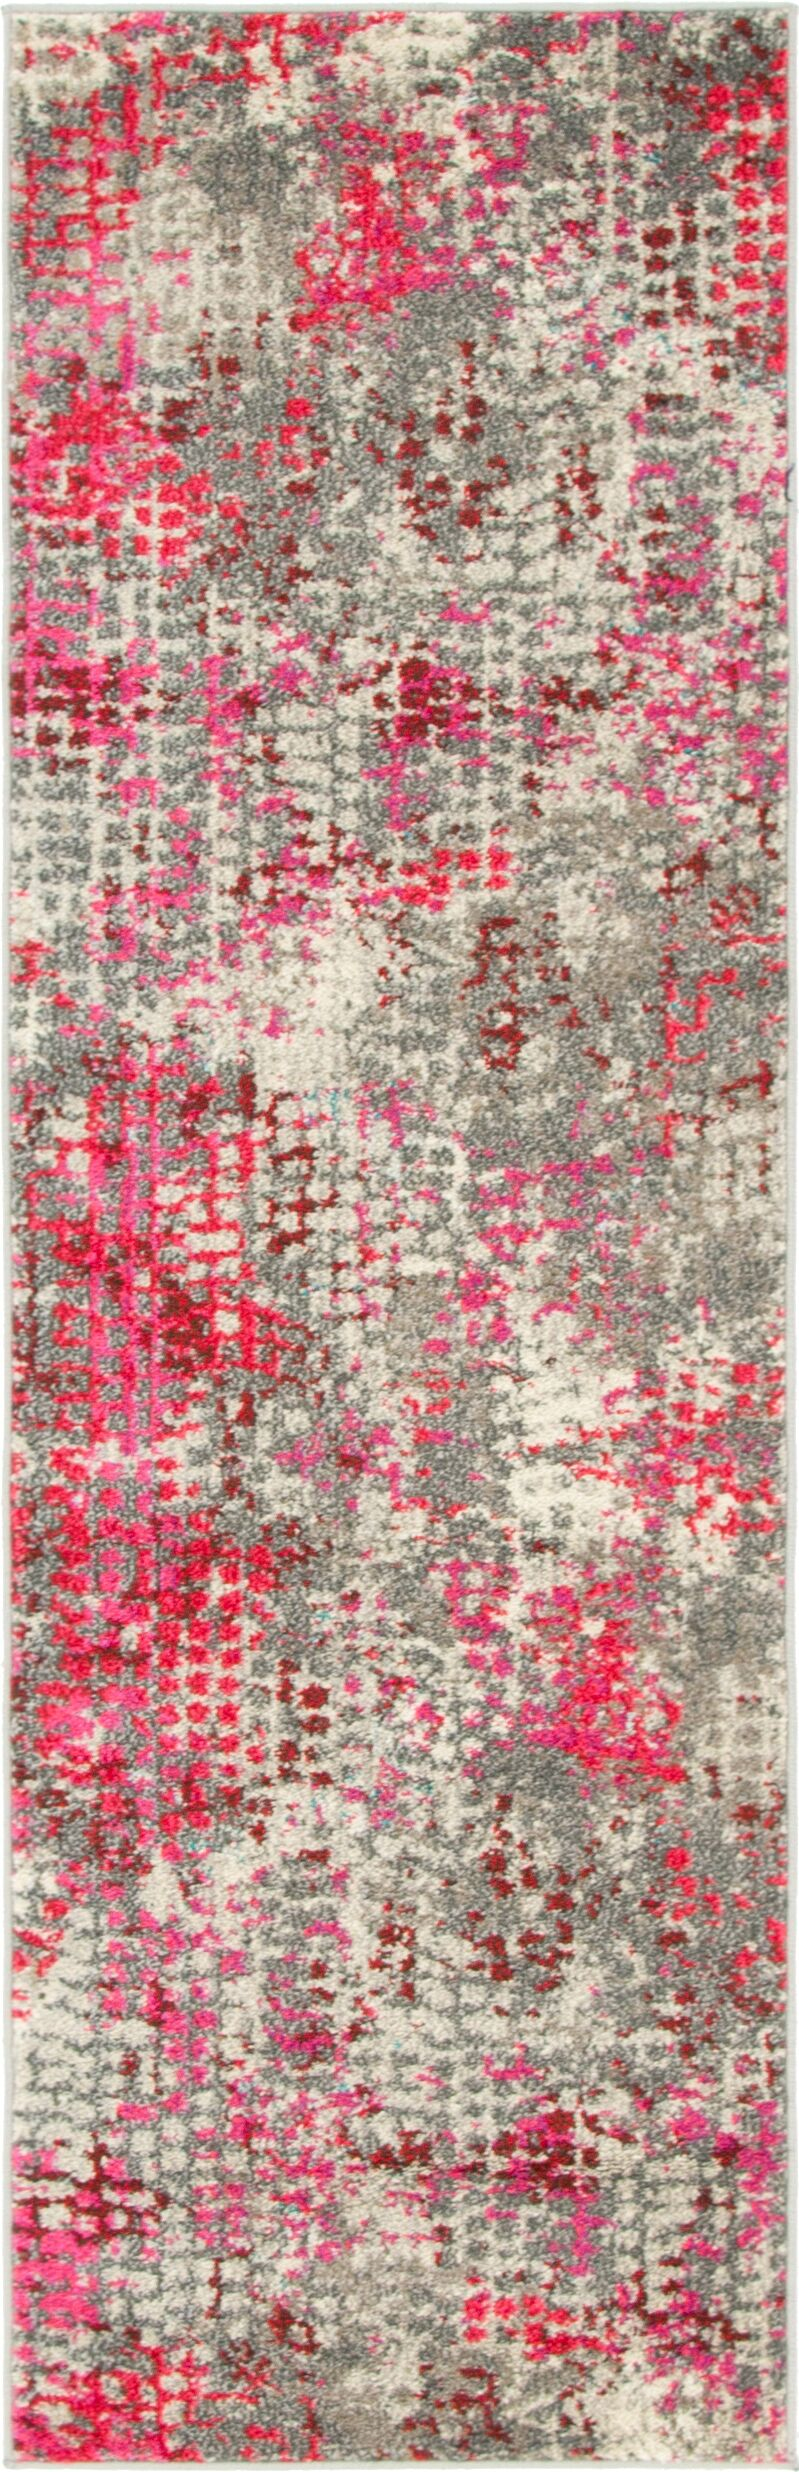 Piotrowski Pink Area Rug Rug Size: Rectangle 2'2